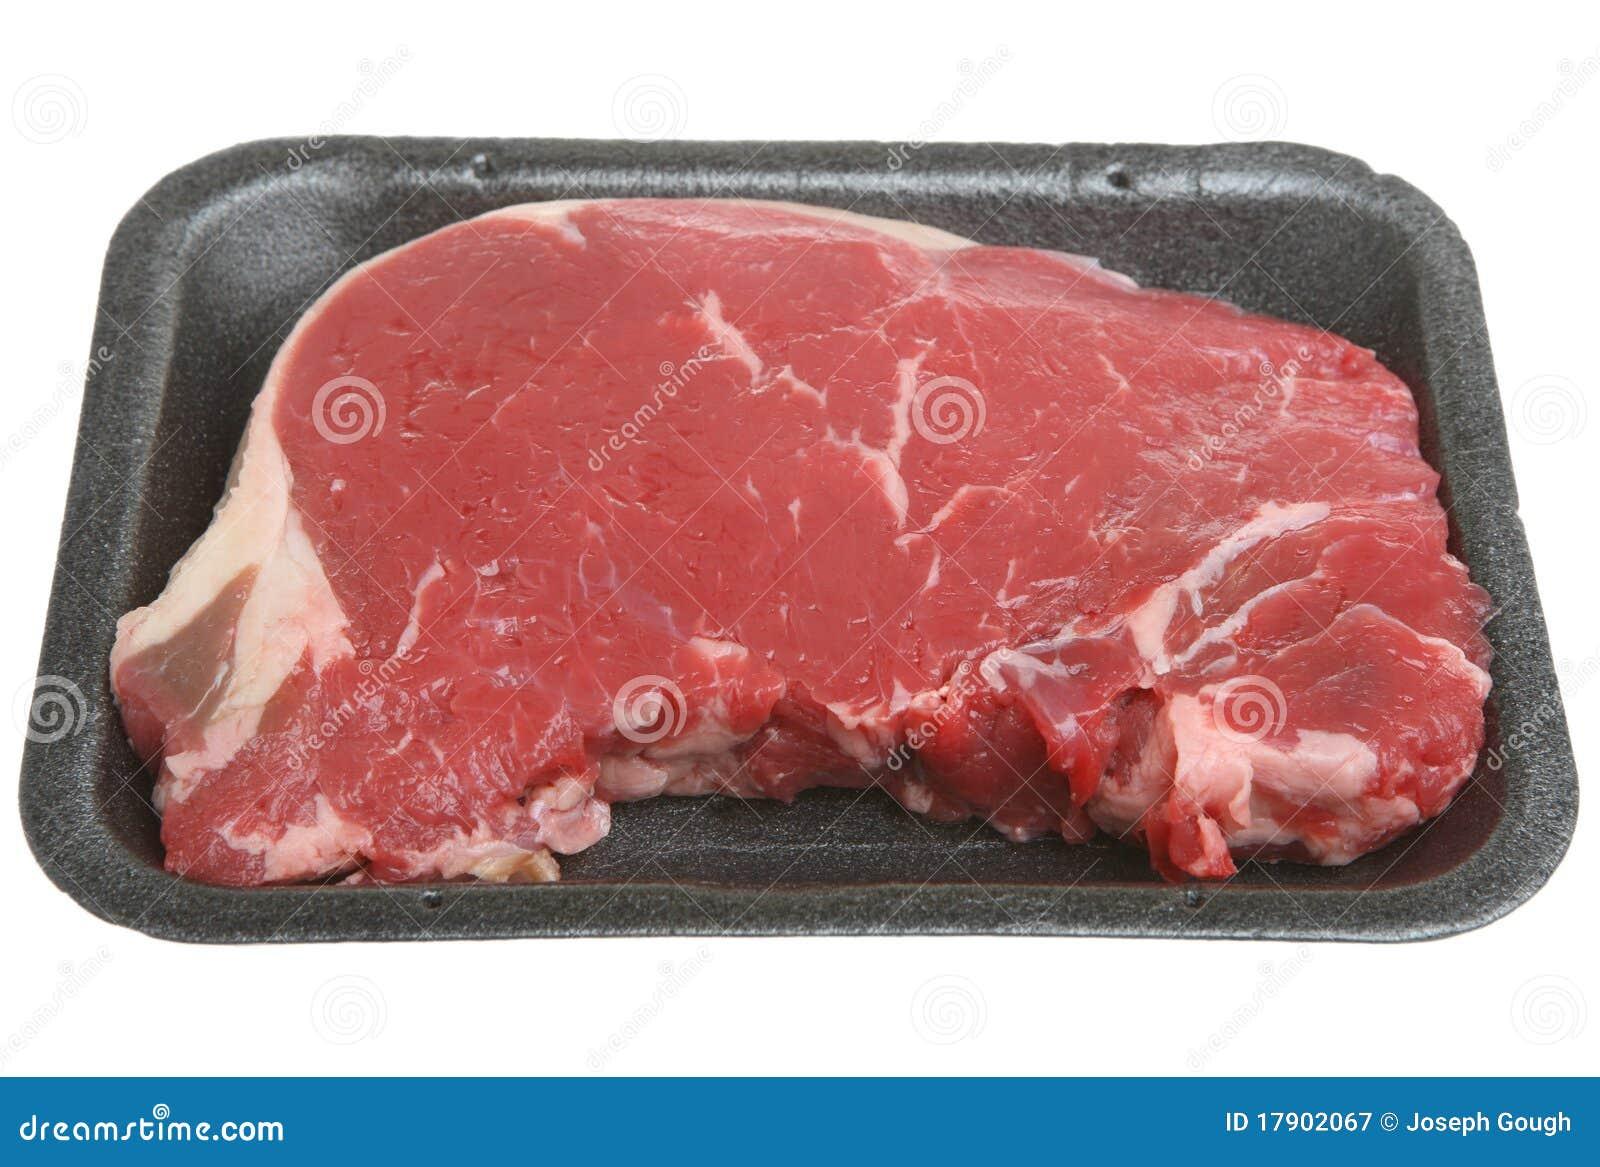 how to prepare raw steak